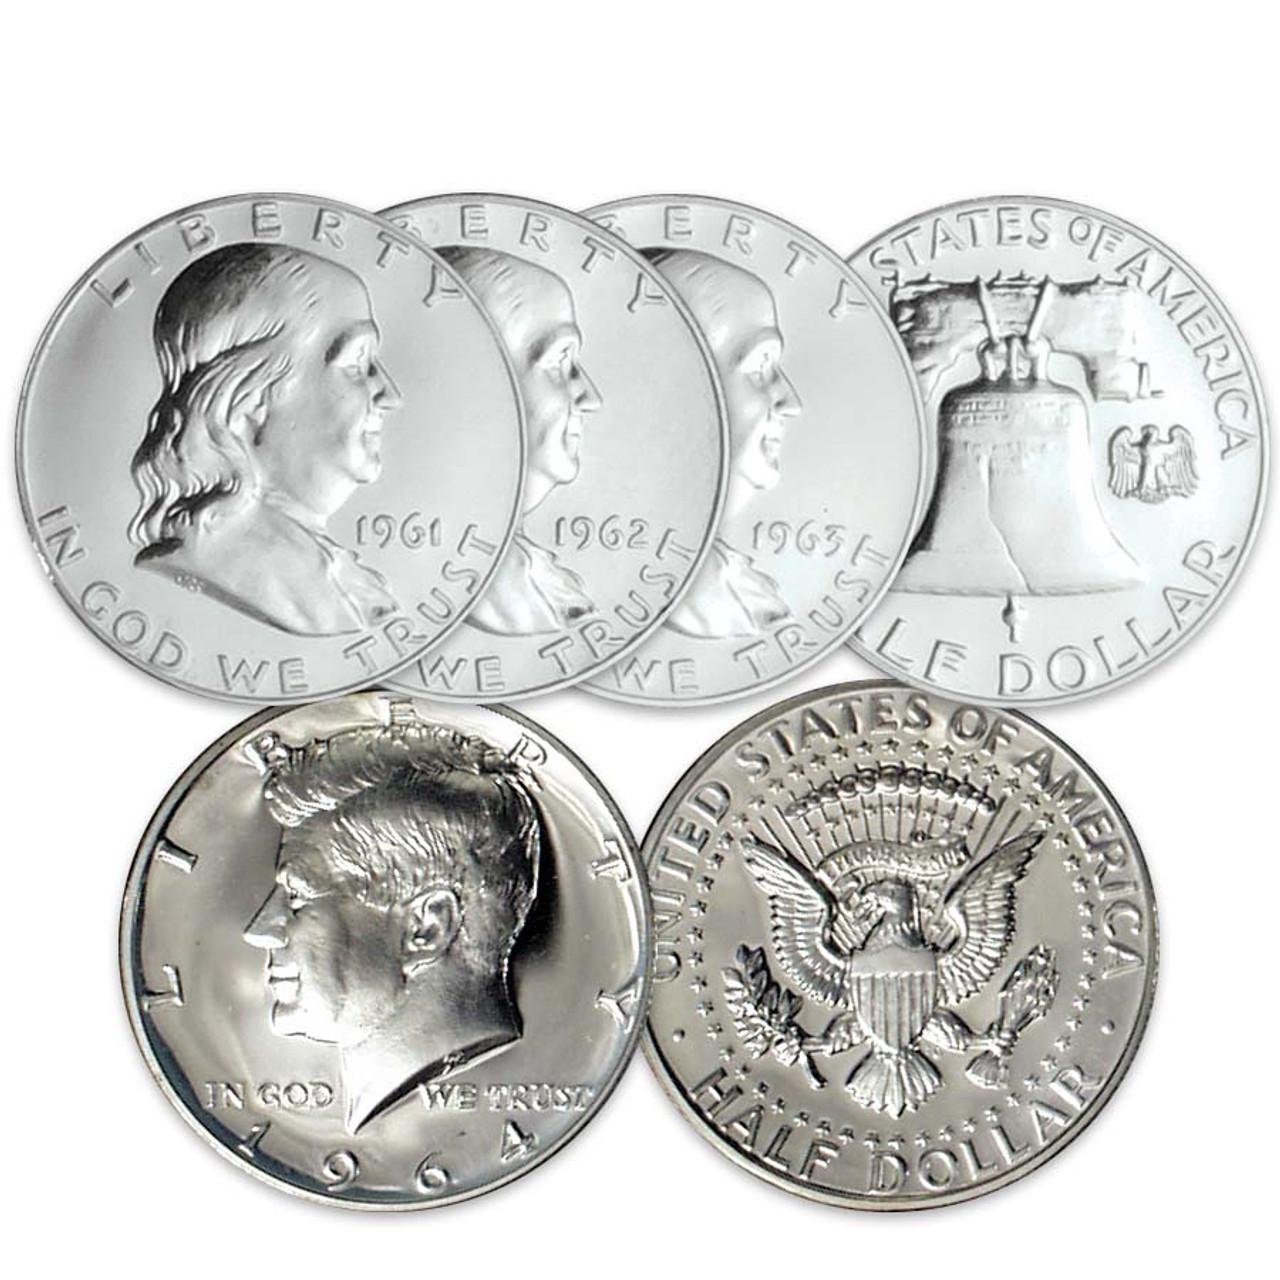 1961-1963 Franklin Silver Half Dollar Proof Trio with 1964 Kennedy Silver Half Dollar Proof